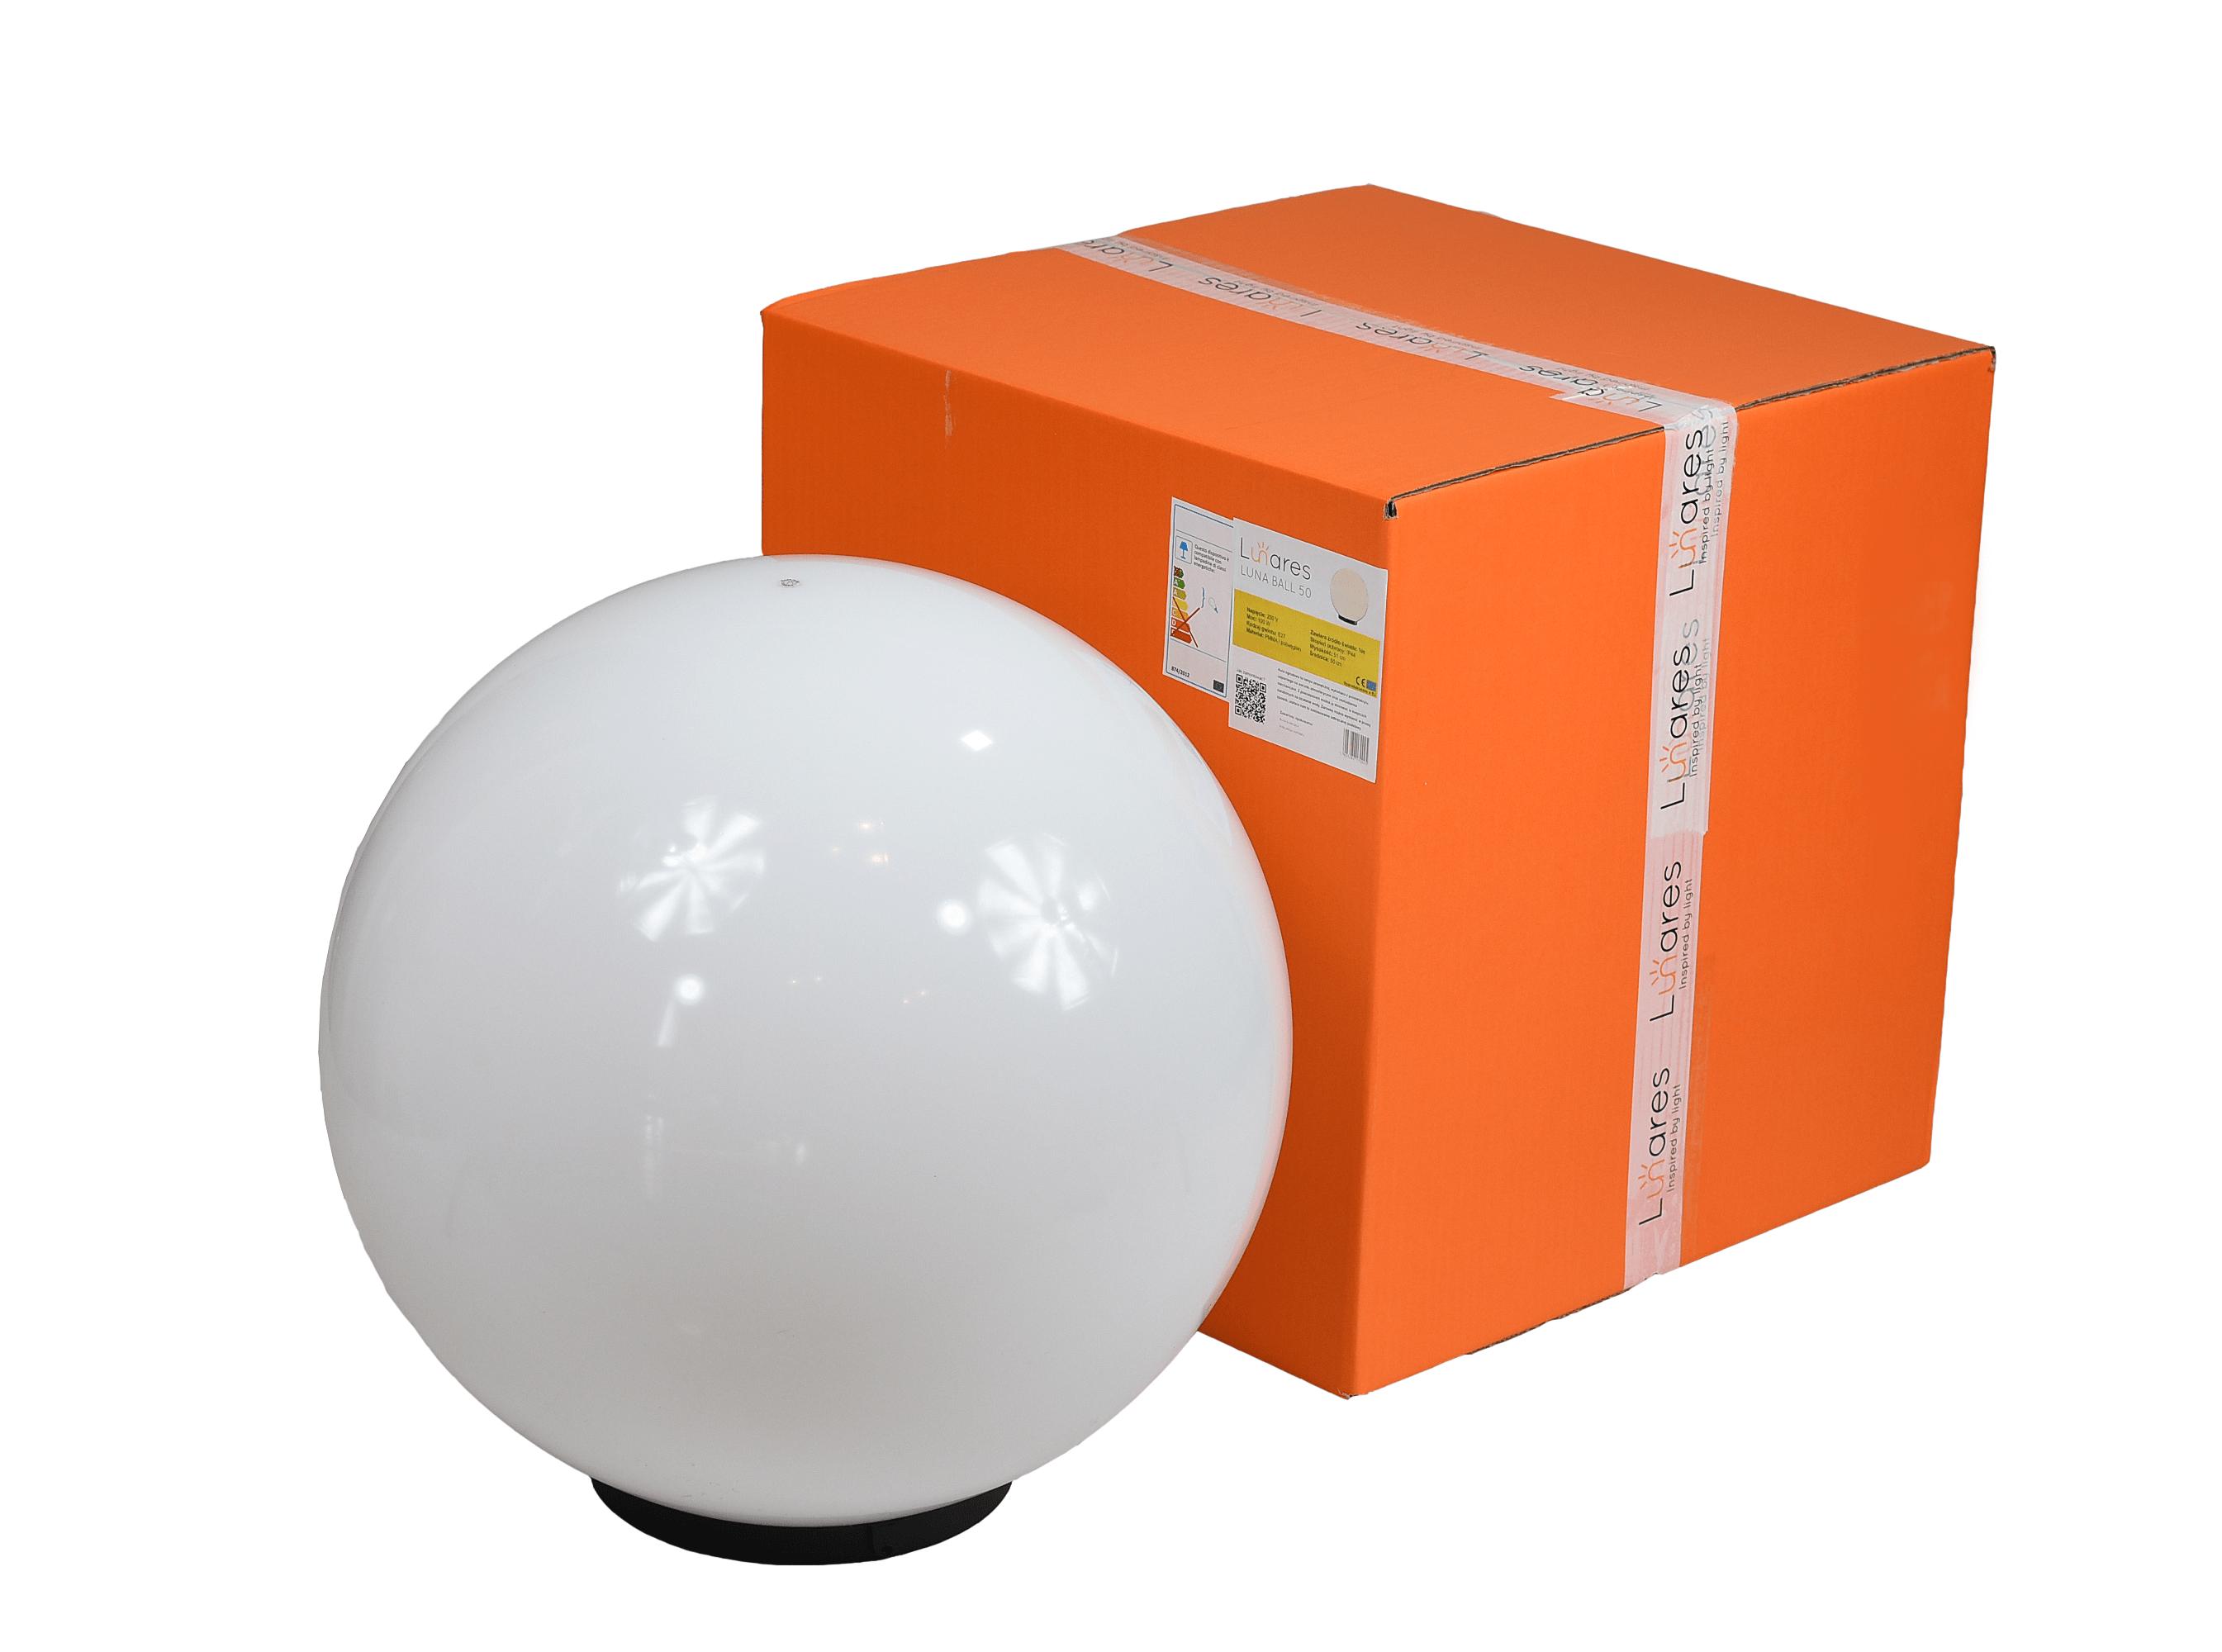 Dekoracyjna lampa ogrodowa Kula - Luna ball 50 cm